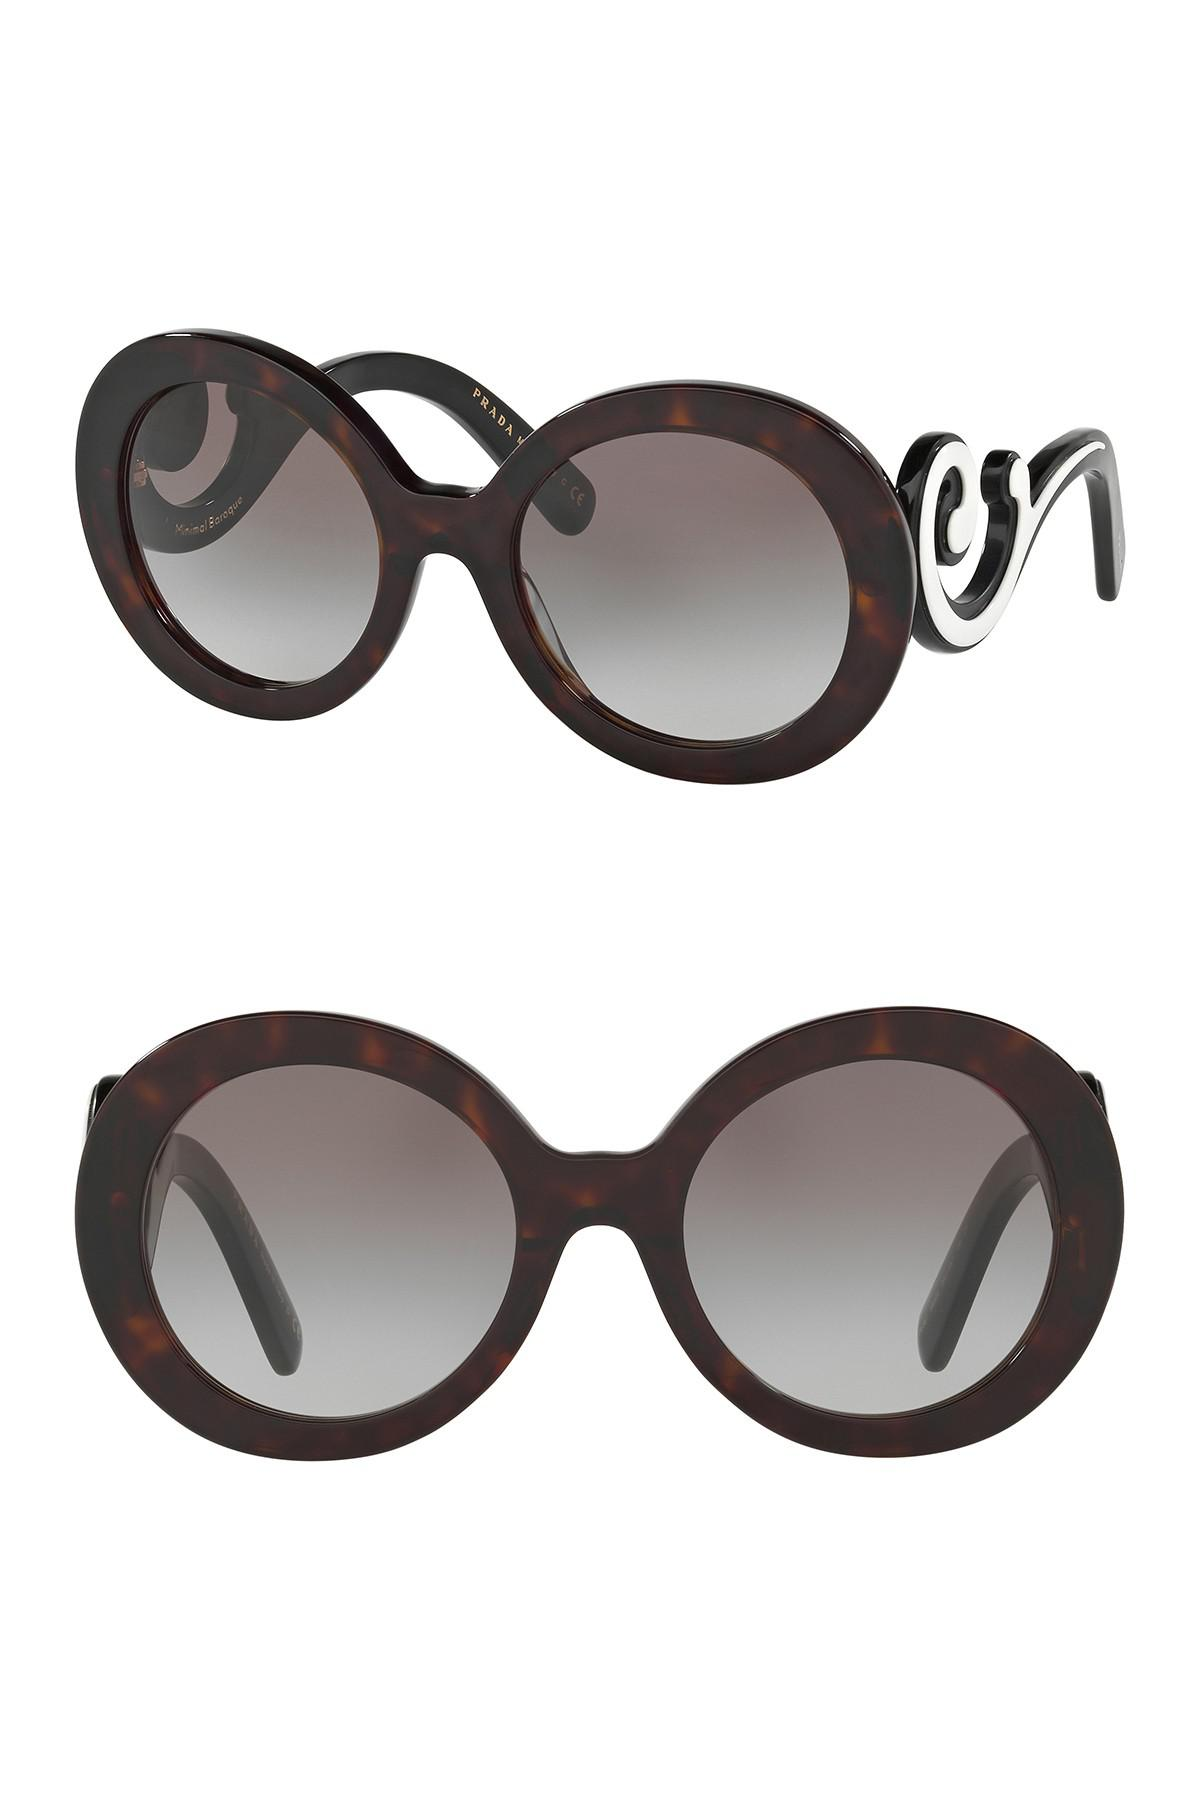 89aafb349b Lyst - Prada Women s 55mm Round Catwalk Minimal Baroque Sunglasses